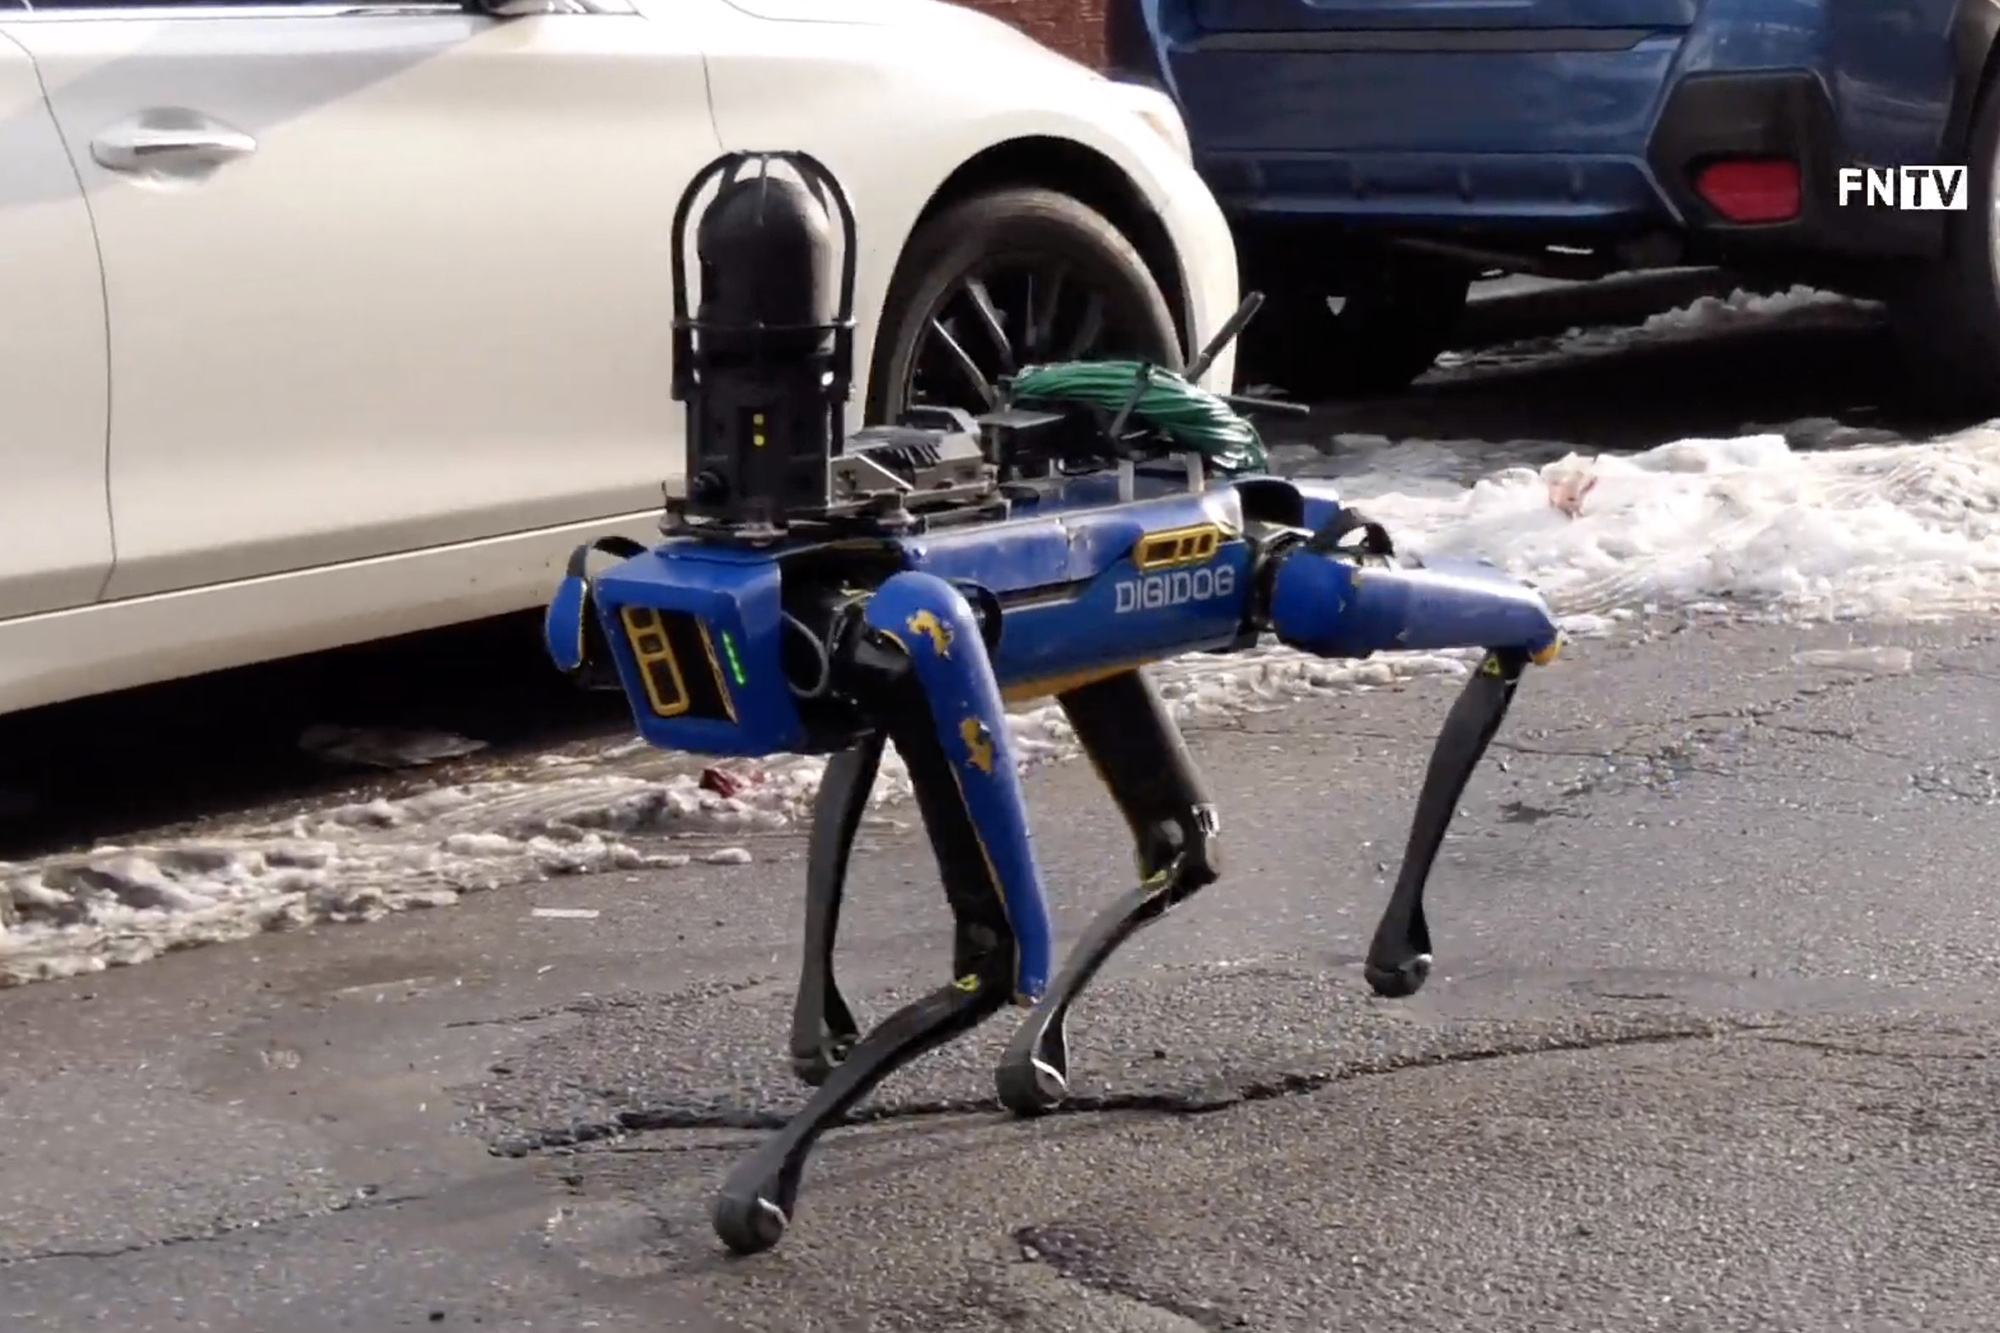 nypd-robot-dog-2.jpg?quality=80&strip=al